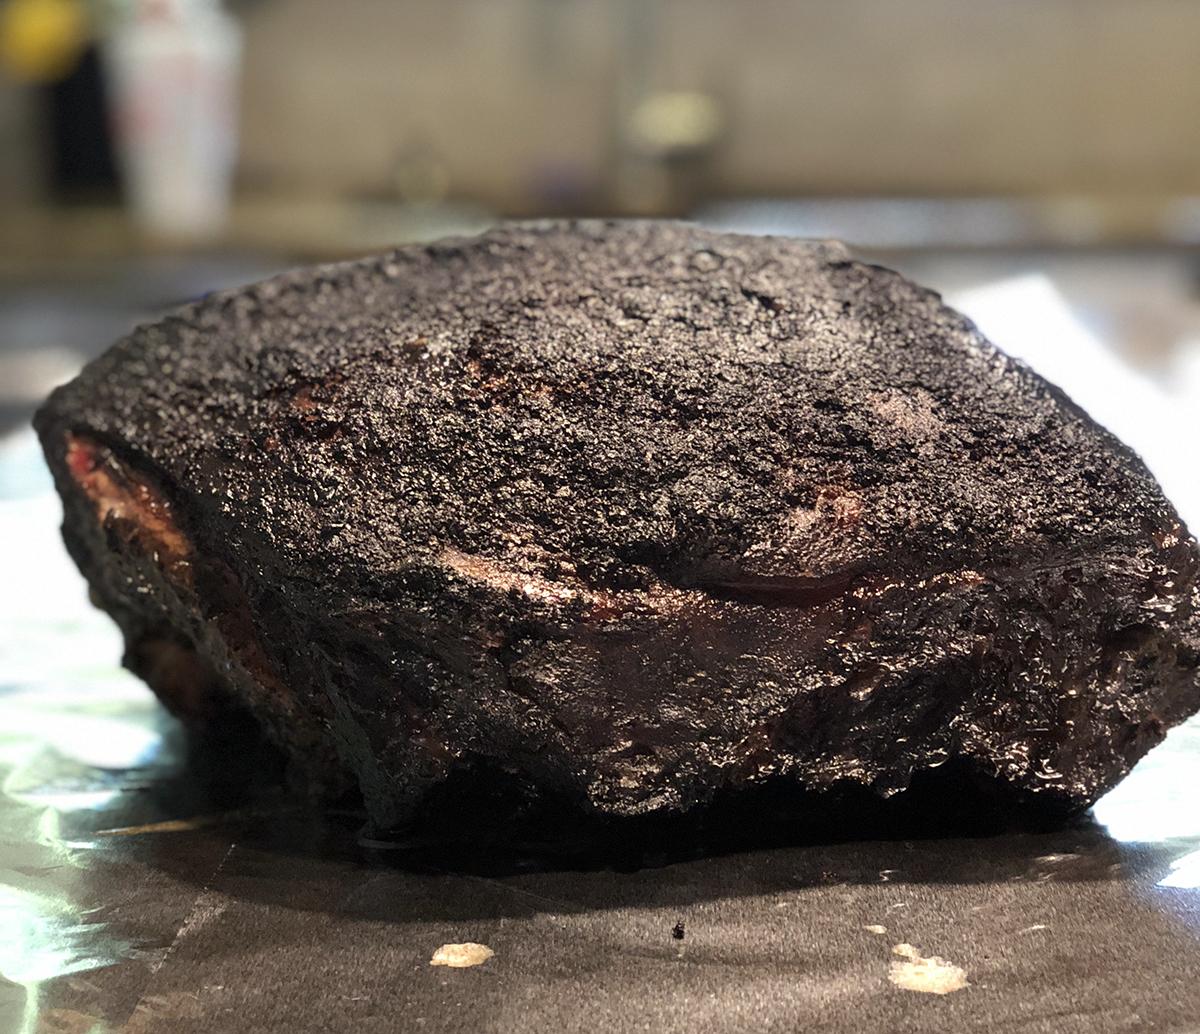 Smoked Pork butt ready to wrap 01